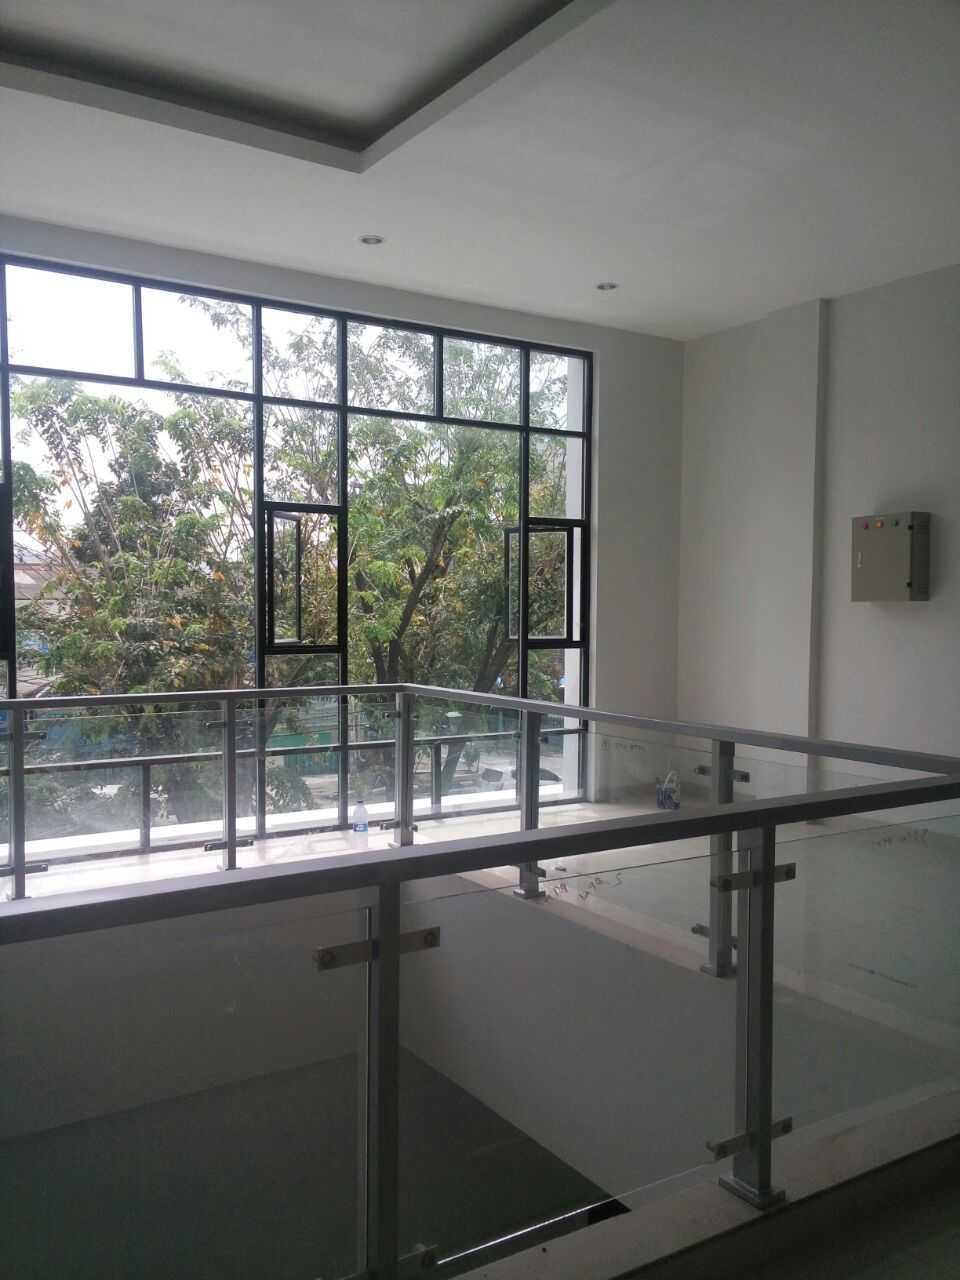 Dmnt Architects Ruko Ismud Medan, Kota Medan, Sumatera Utara, Indonesia Medan, Indonesia Whatsapp-Image-2017-03-10-At-2  28620